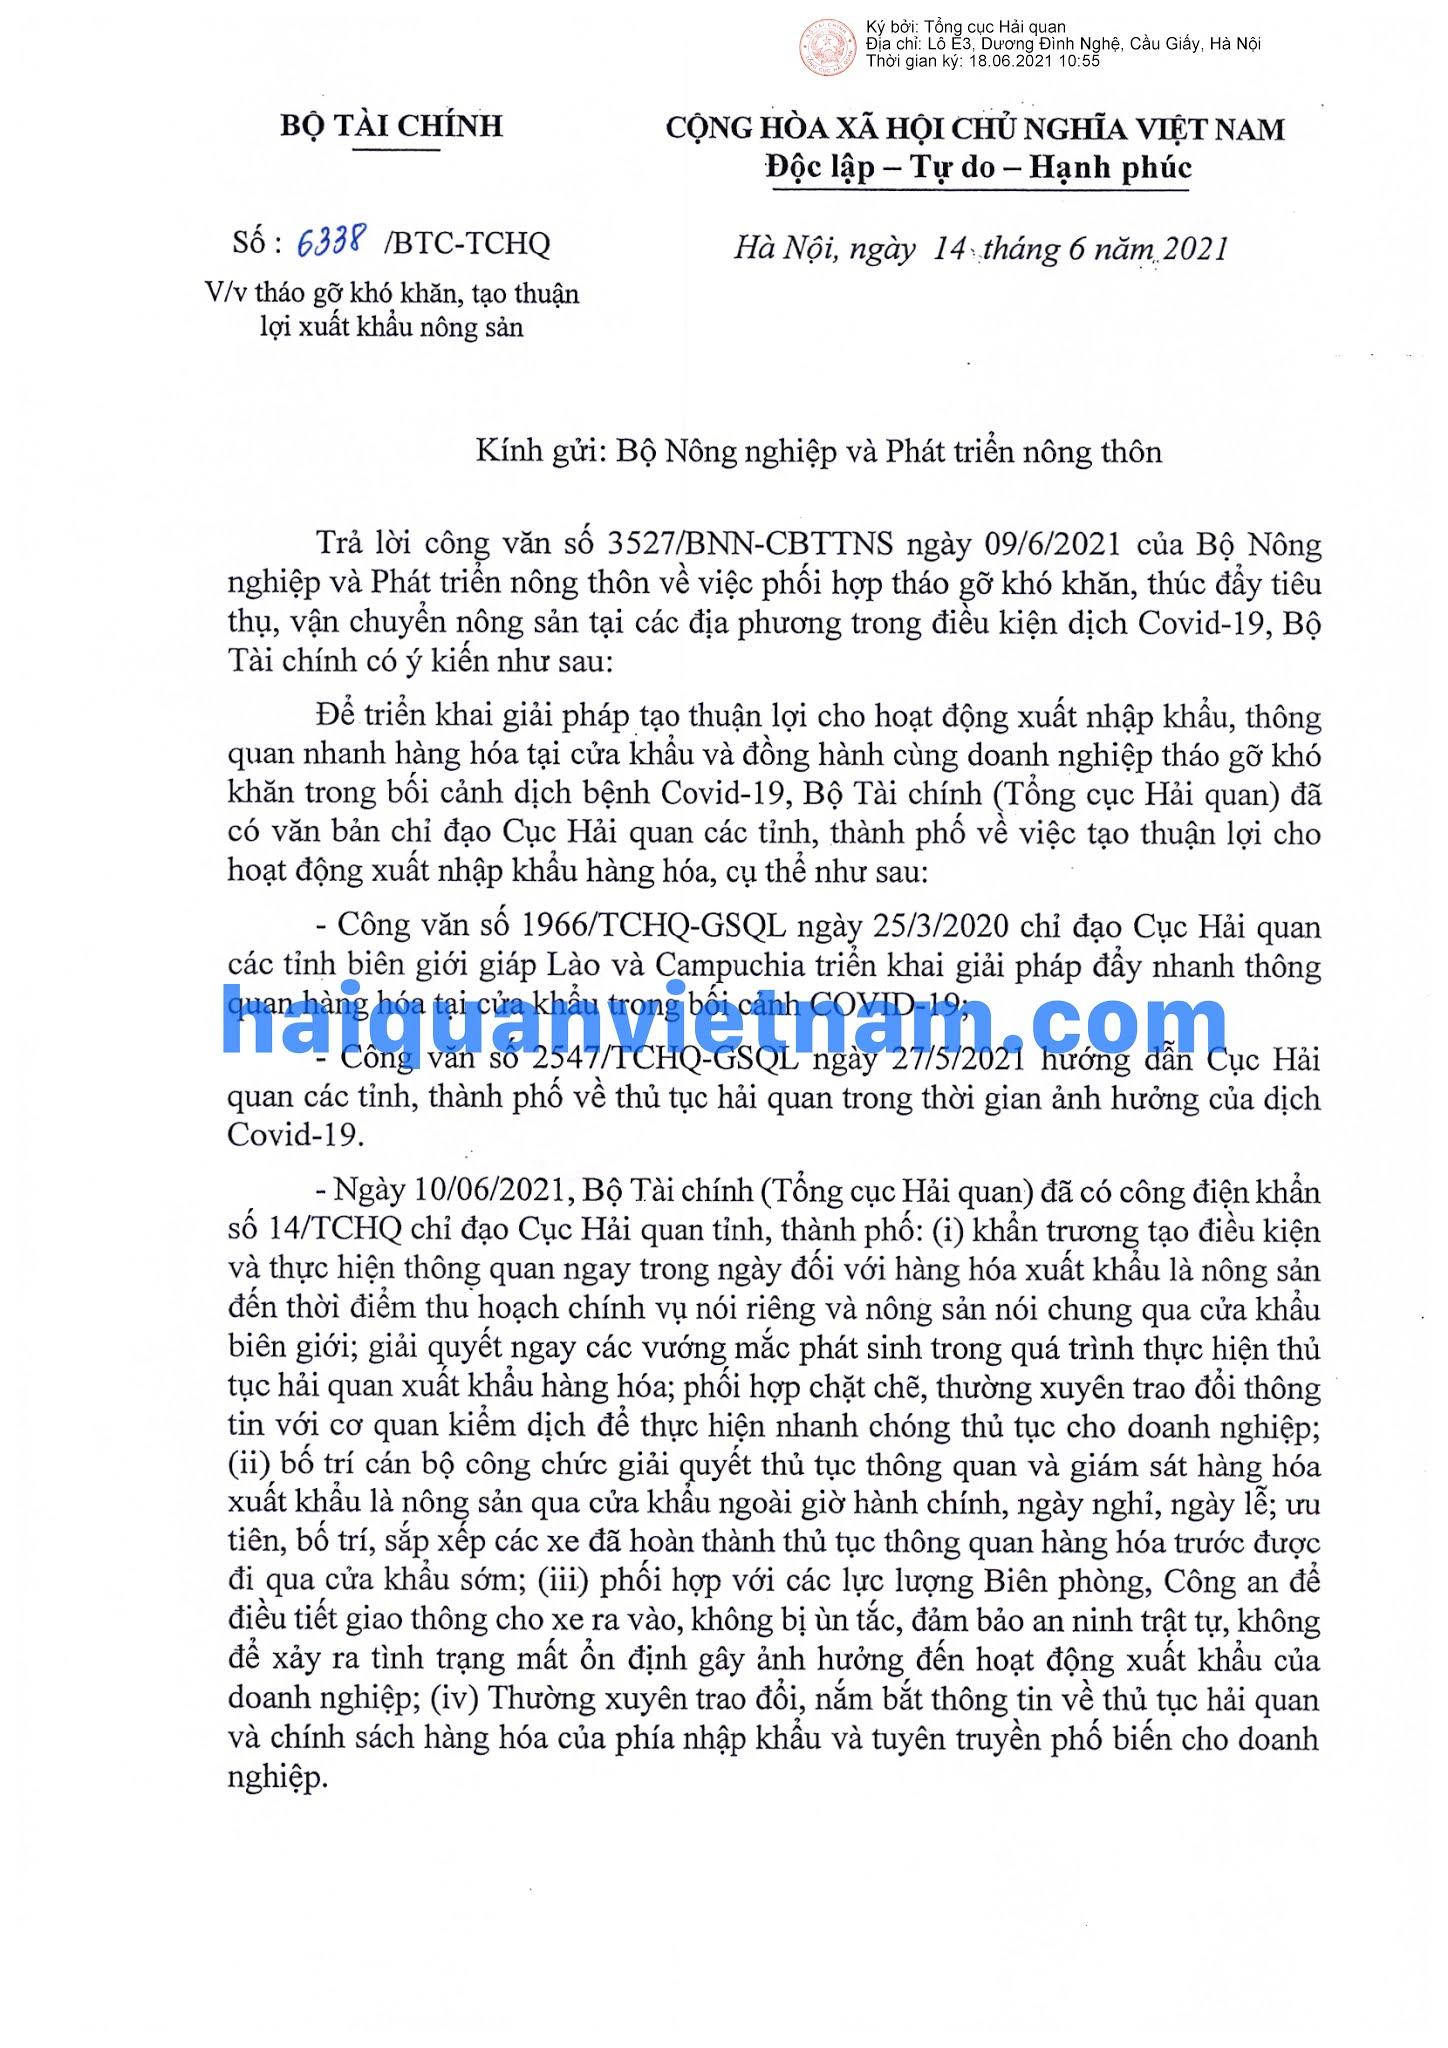 [Image: 210614_6338_BTC-TCHQ_haiquanvietnam_01.jpg]